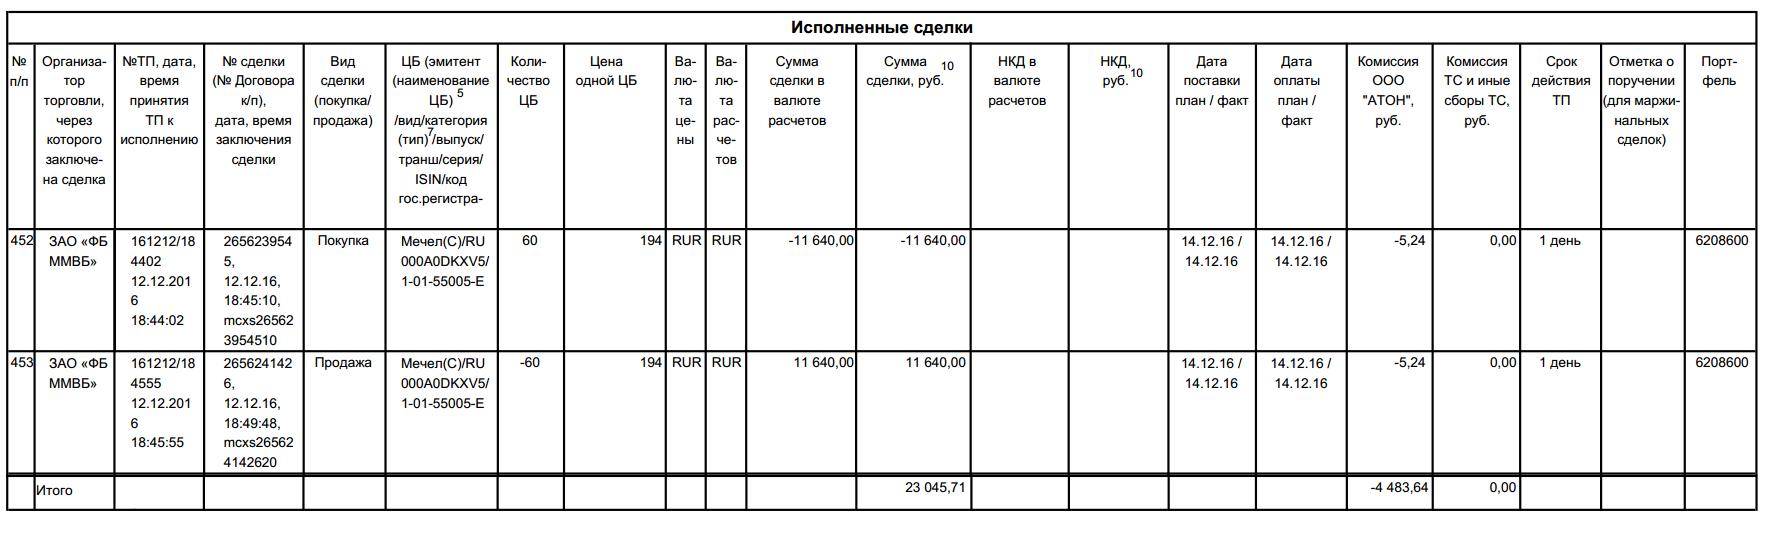 Комиссия на ЛЧИ 2016